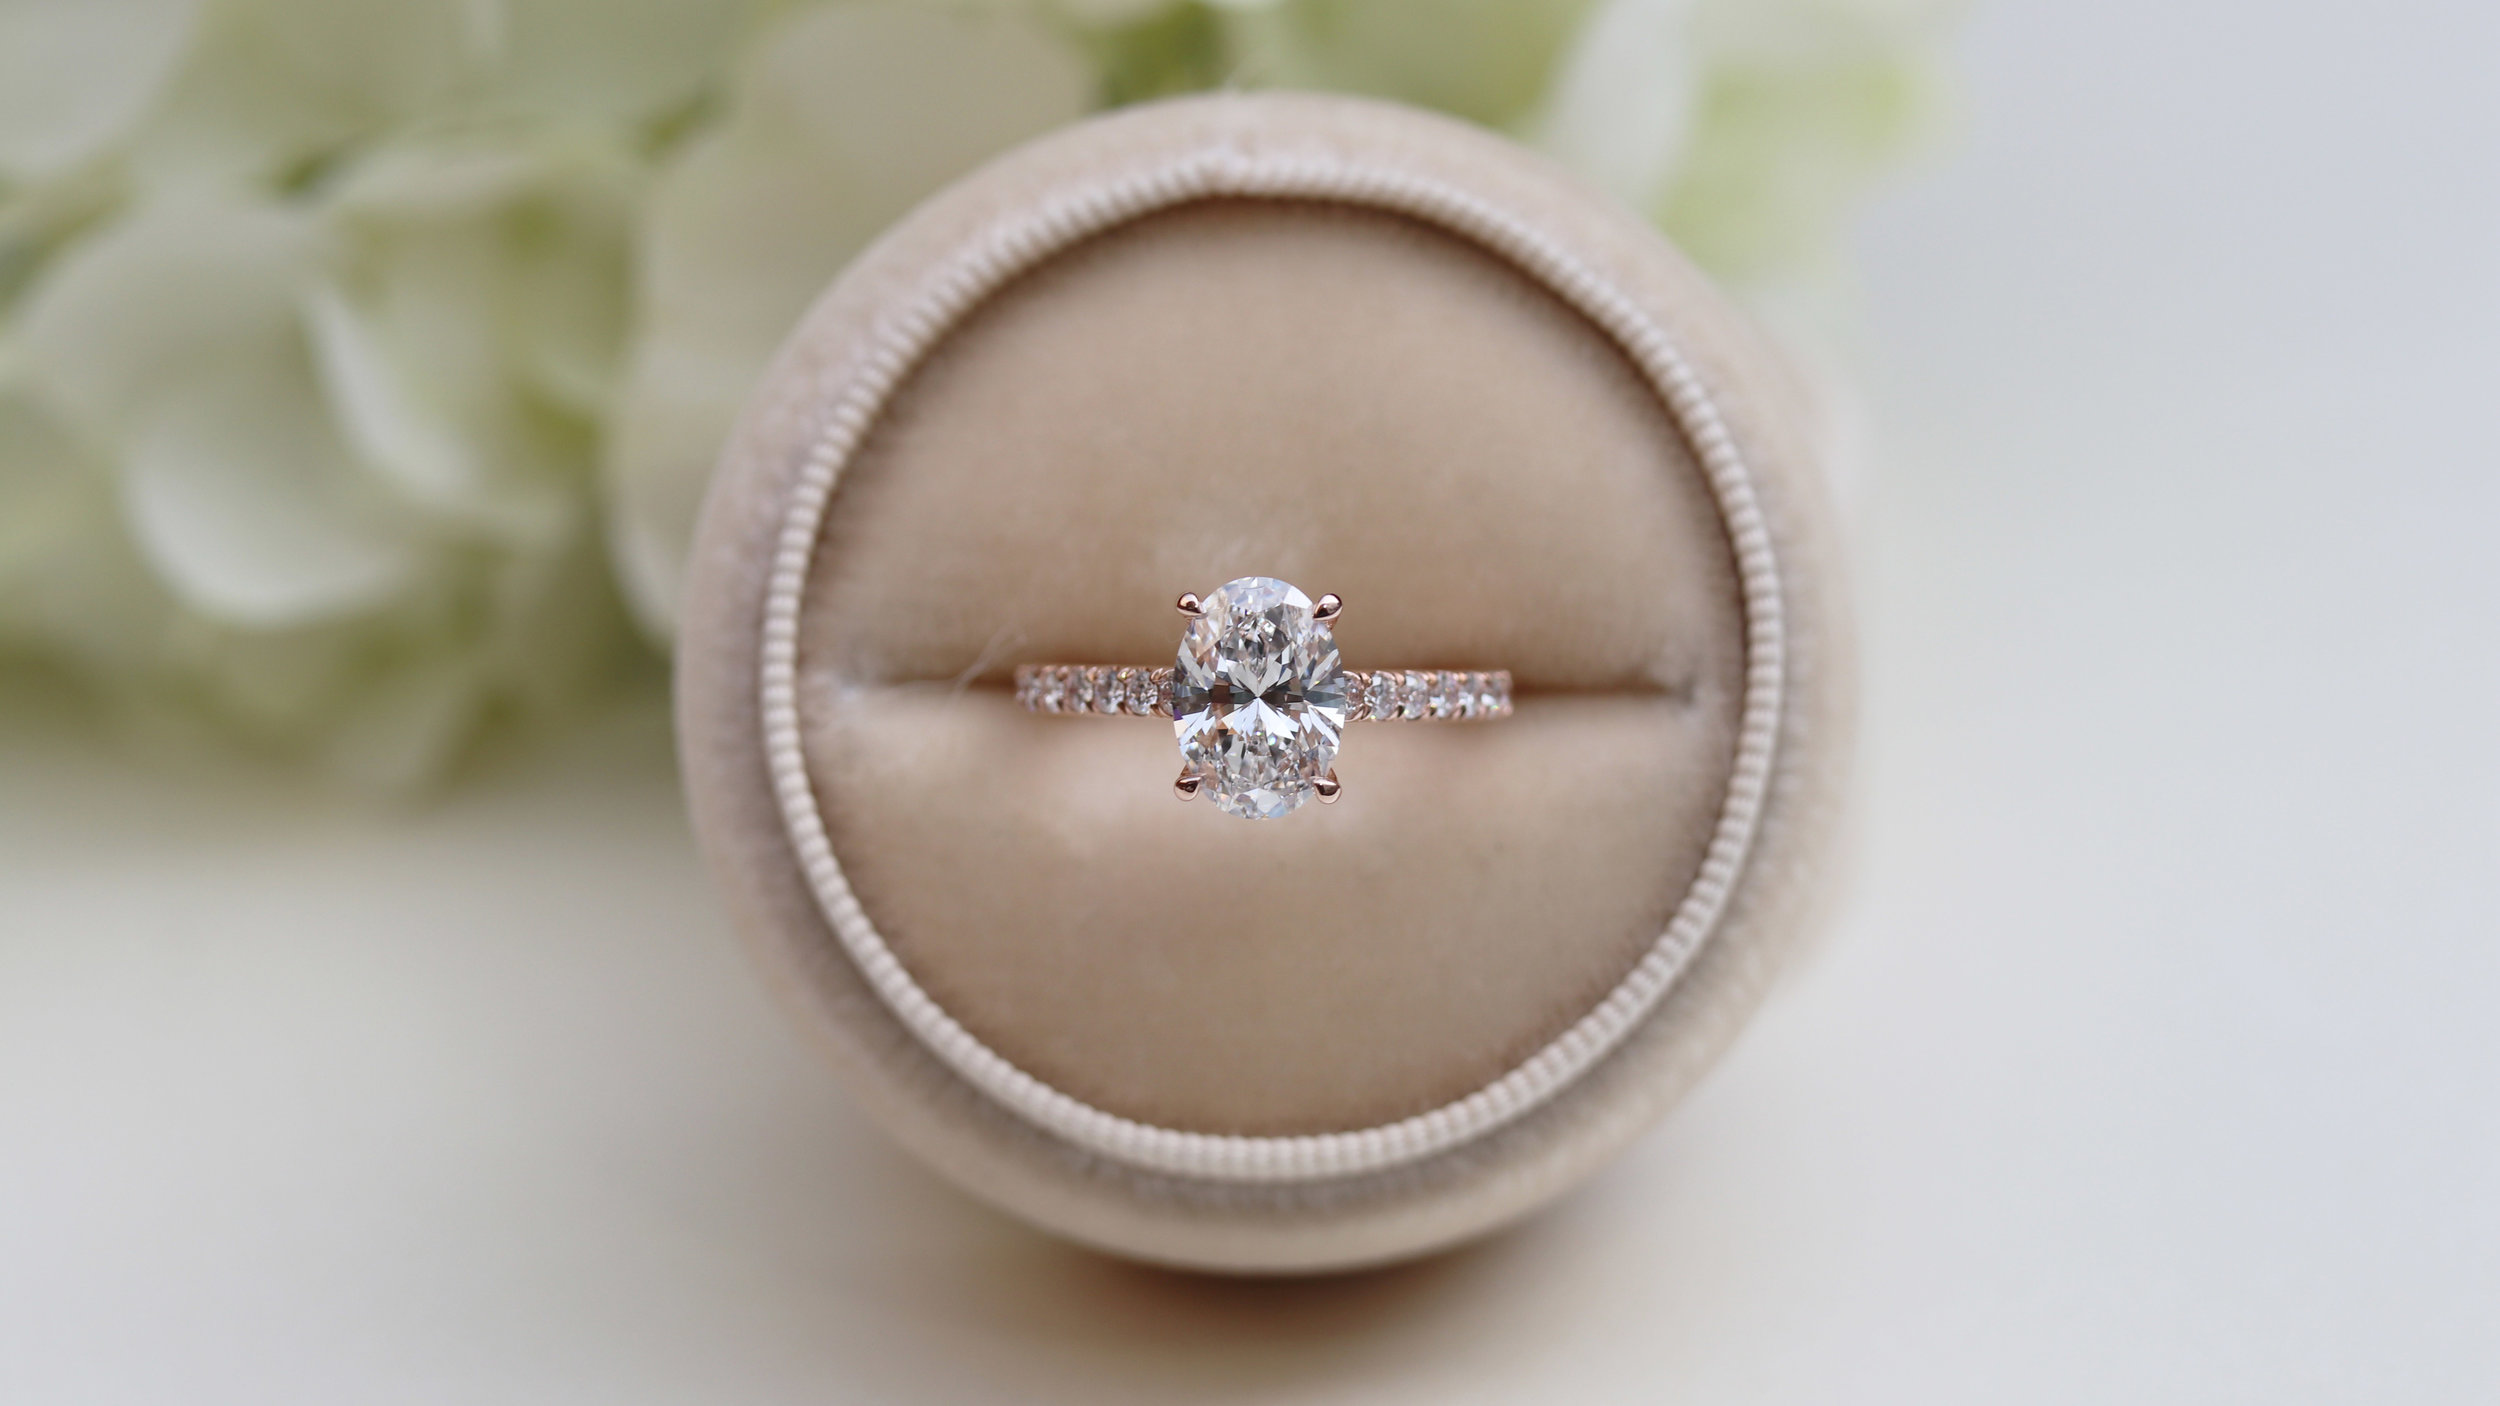 Ada Diamonds Top of the World Rose Gold Lab Diamond Engagement Ring with lab diamond halo and lab diamond band